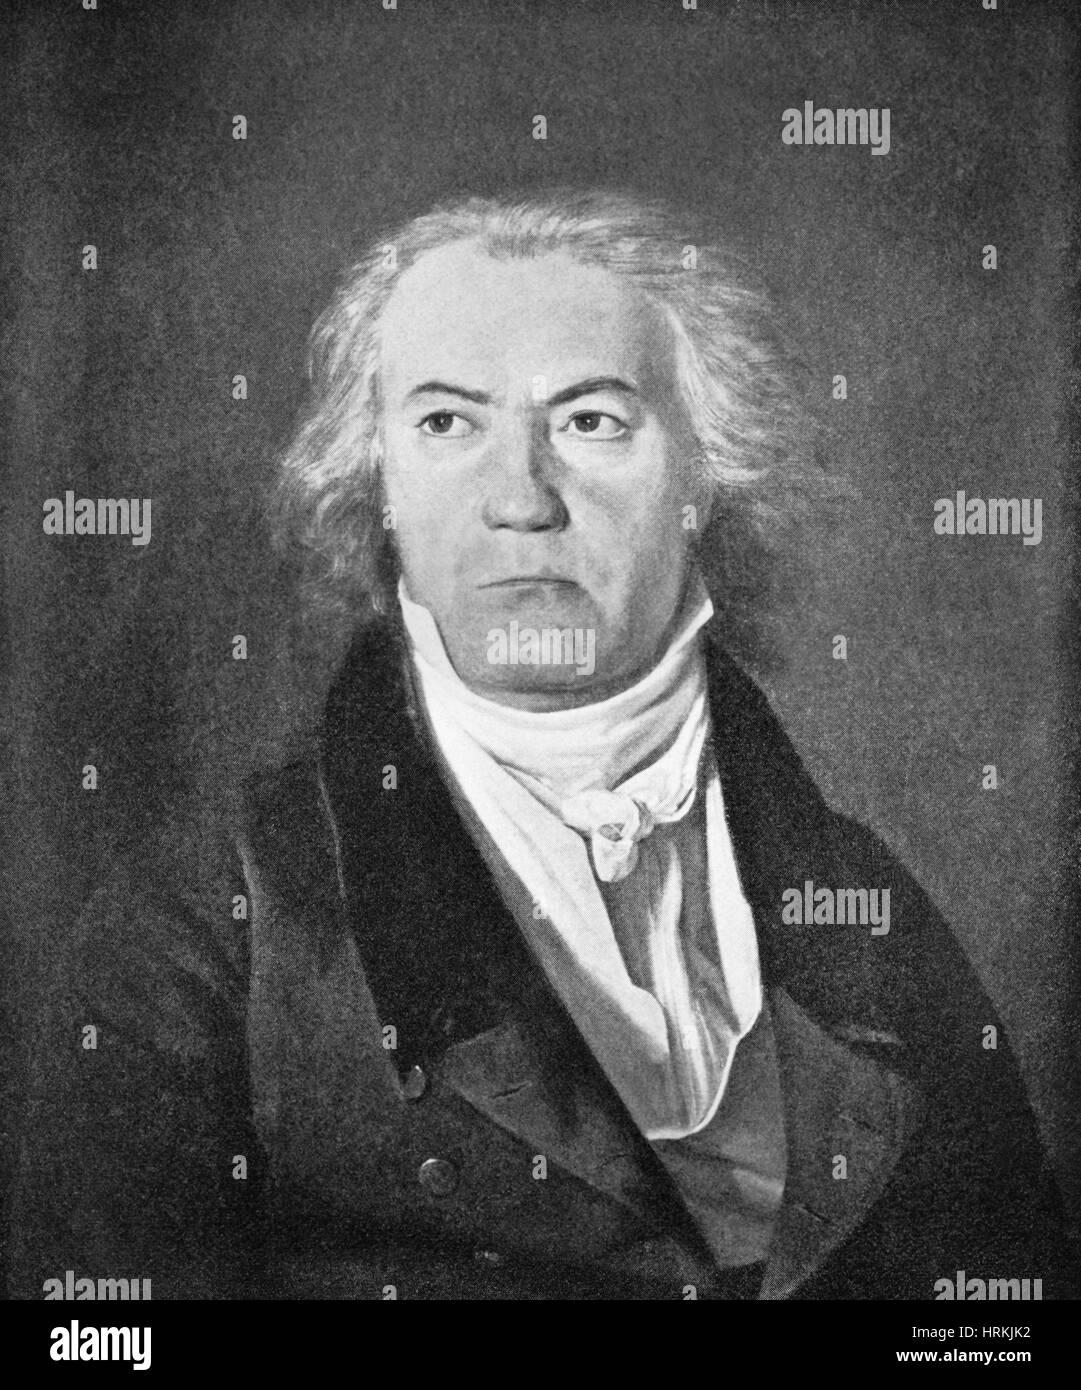 Ludwig van Beethoven. German Composer - Stock Image